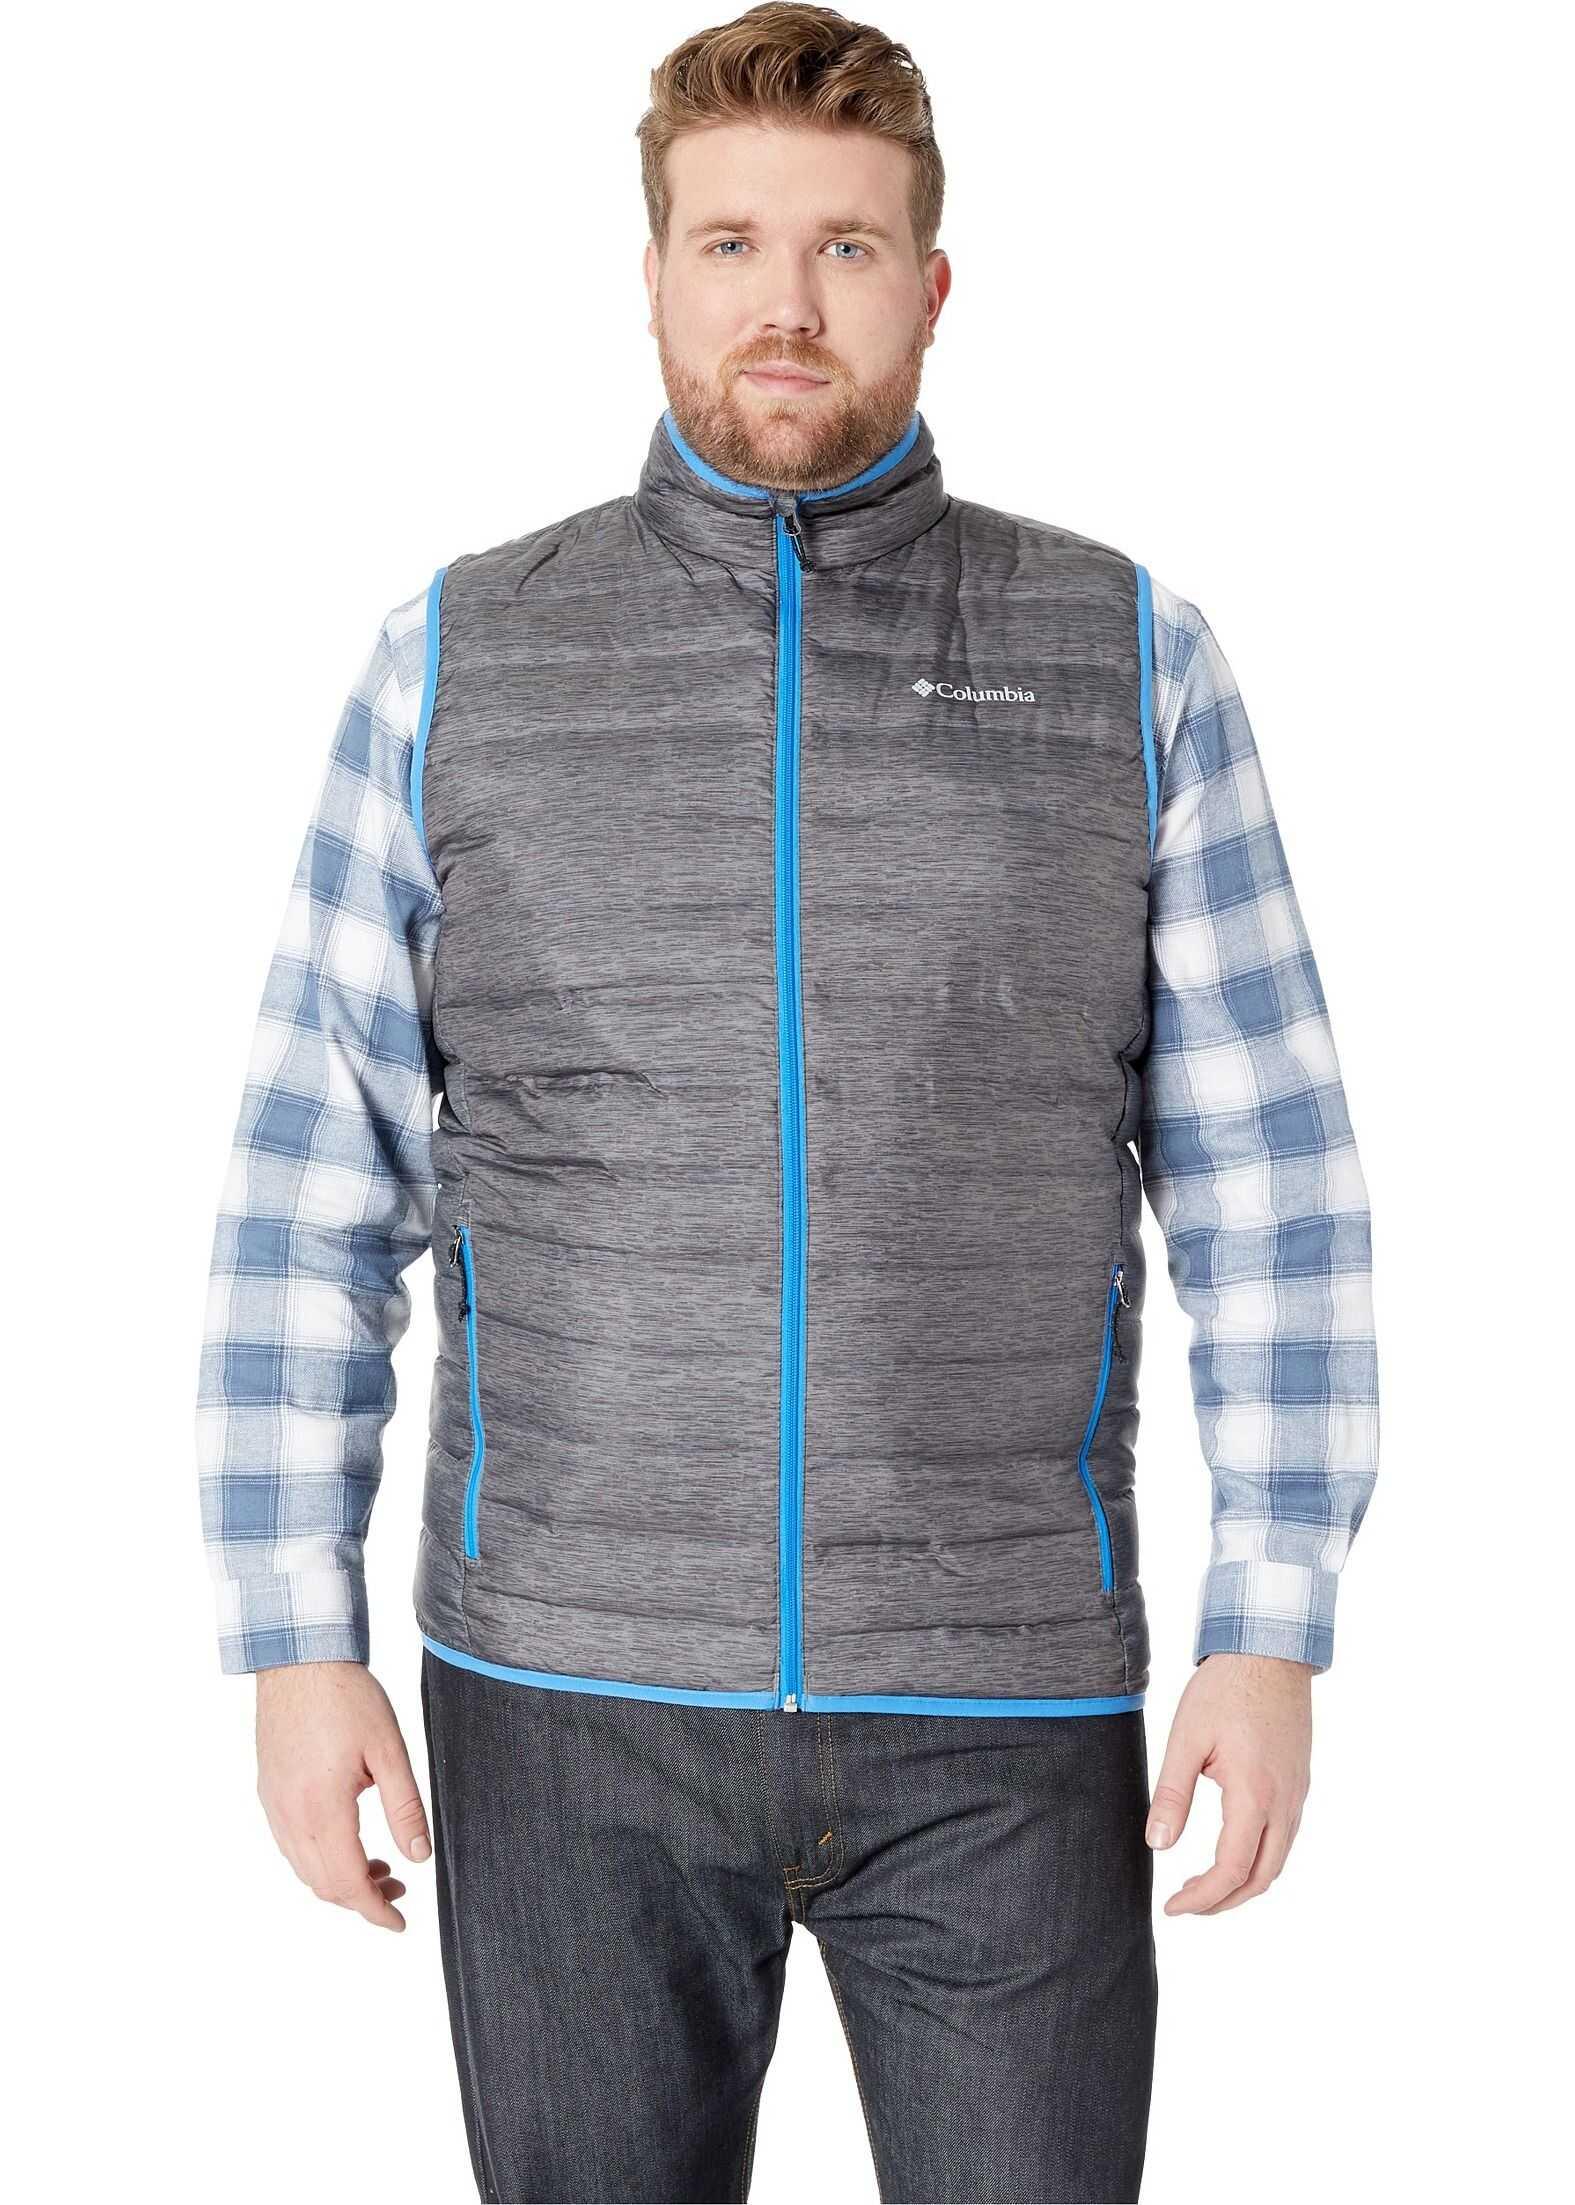 Columbia Big & Tall Lake 22™ Down Vest Charcoal Heather Print/Azure Blue